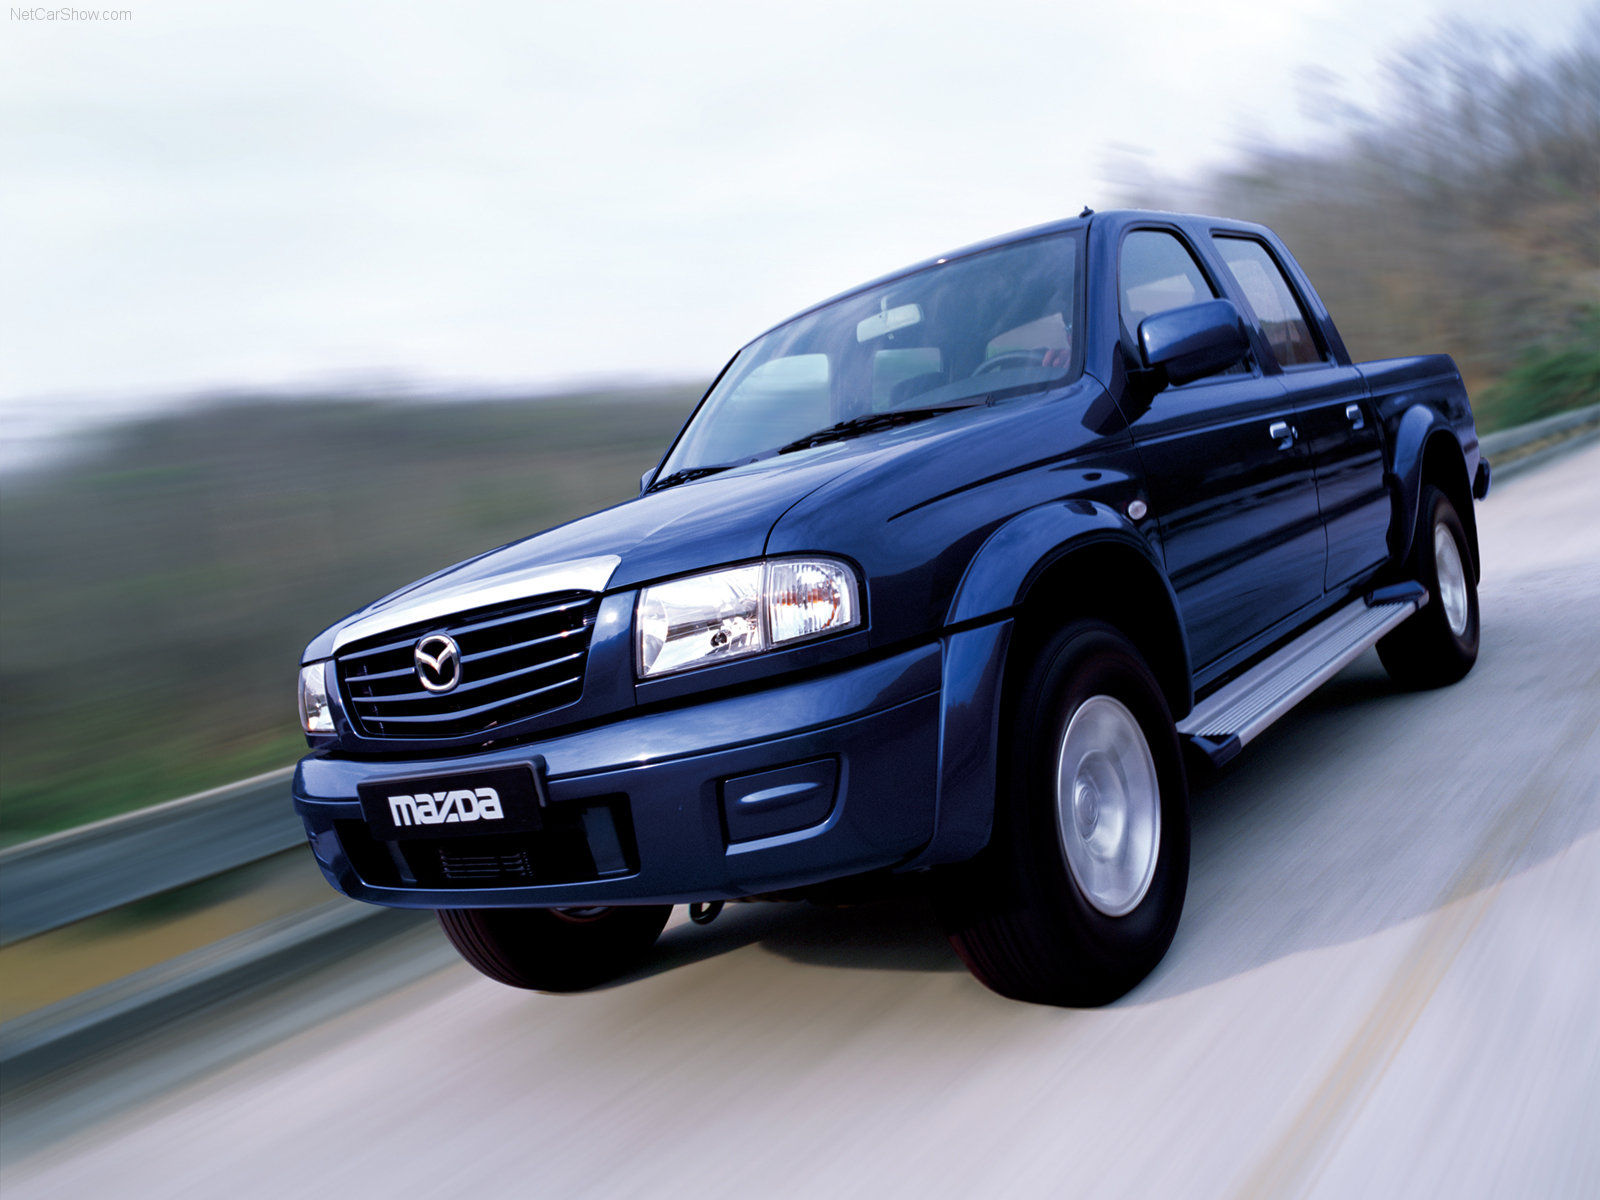 Mazda B2500 Photos Photogallery With 40 Pics Carsbase Com